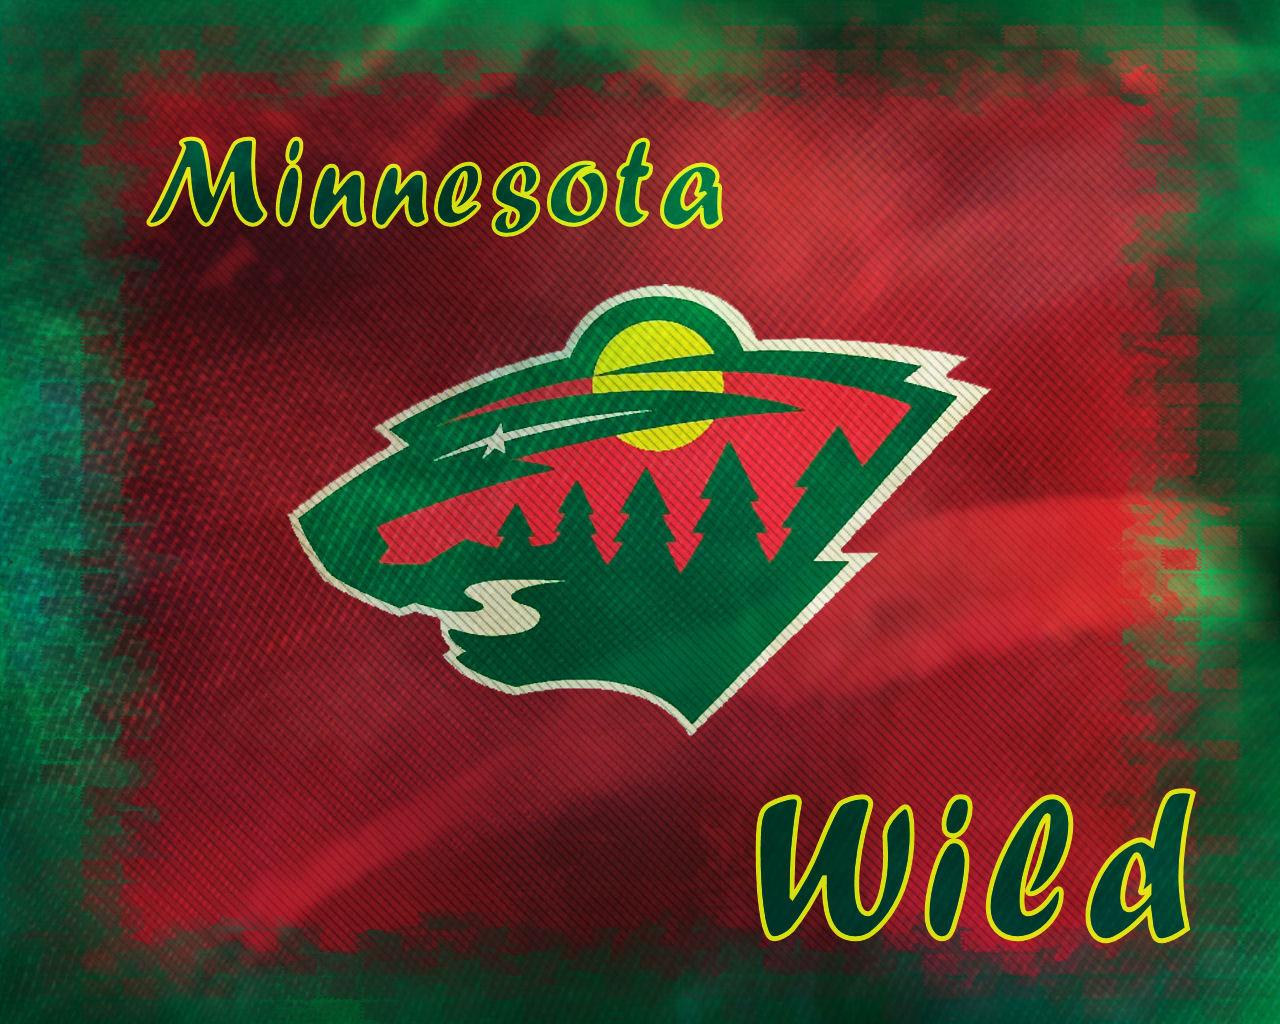 Photo of Minnesota Wild High Resolution Wallpaper 1280x1024